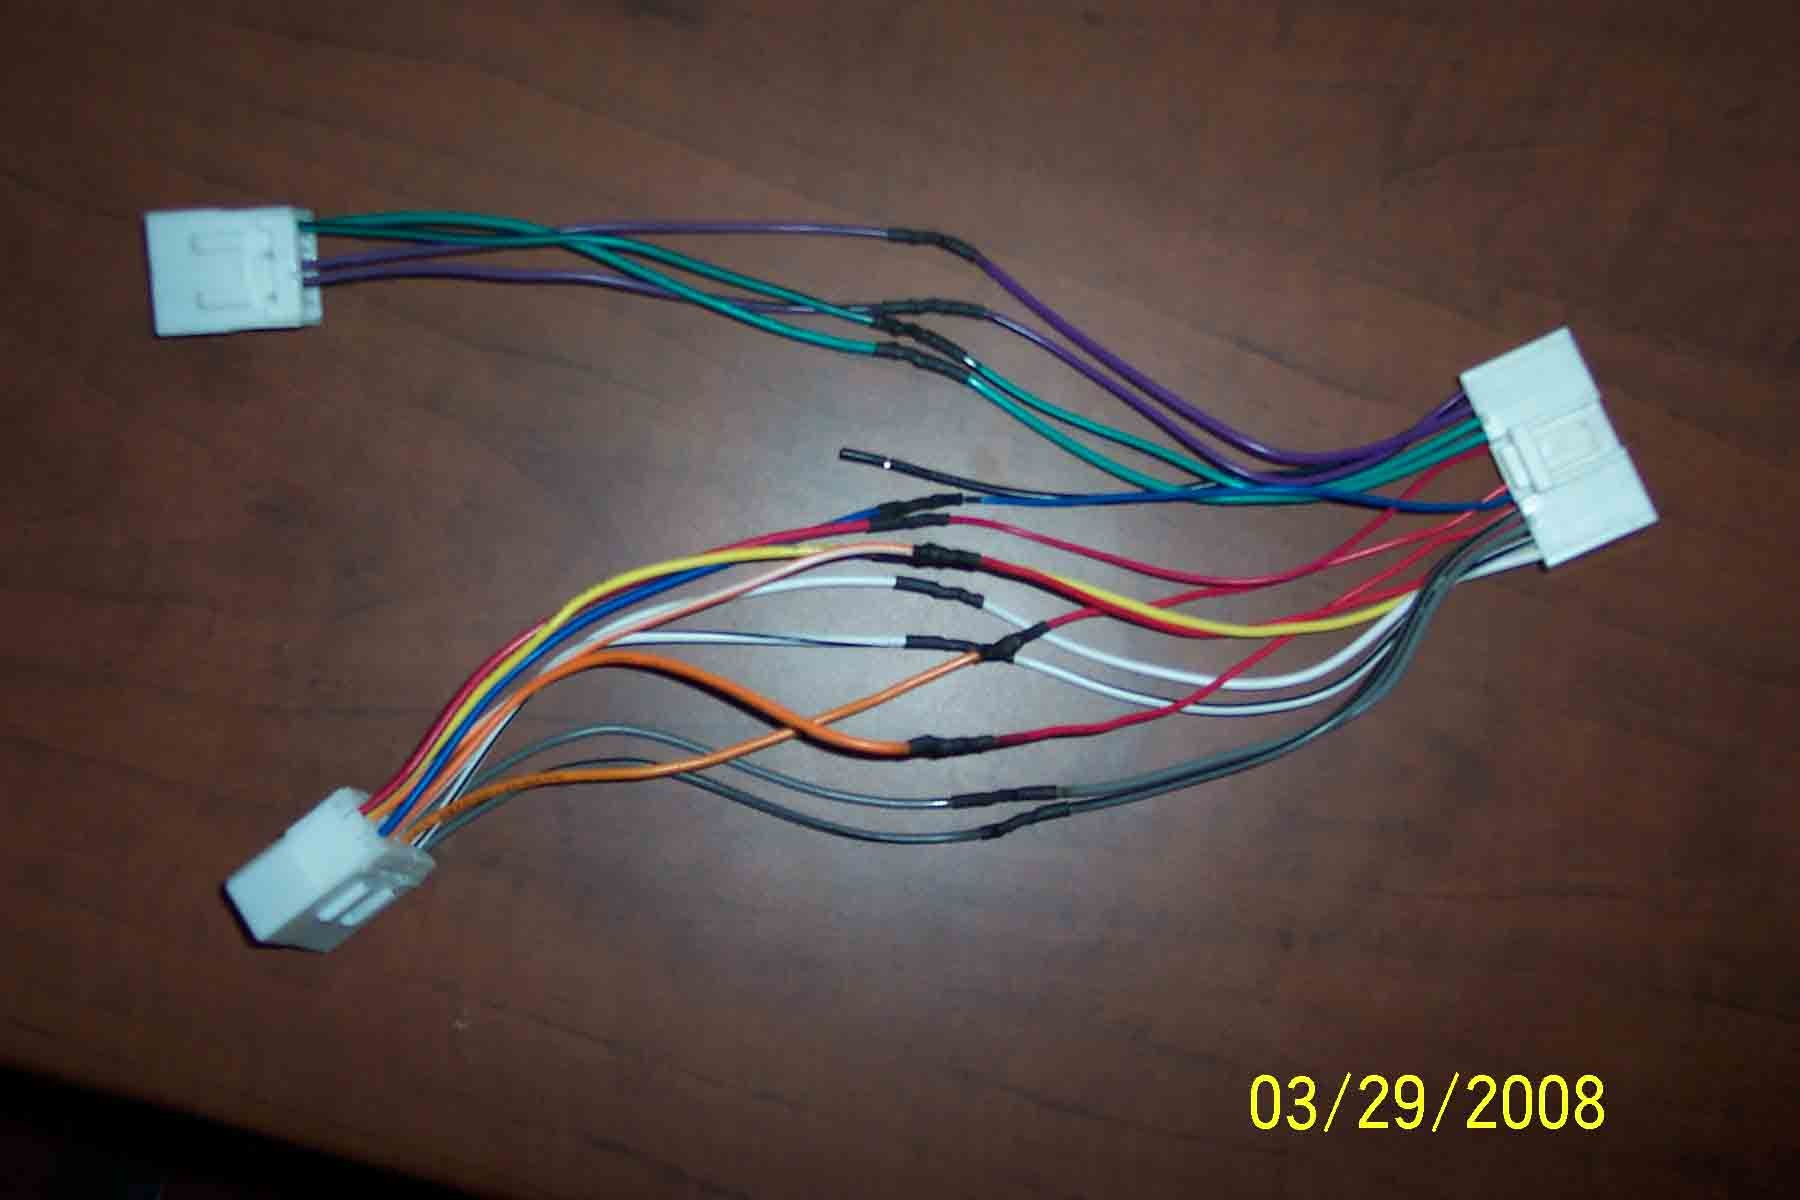 mazda tribute radio wiring diagram ye 0343  mazda mpv stereo wiring free diagram  mazda mpv stereo wiring free diagram